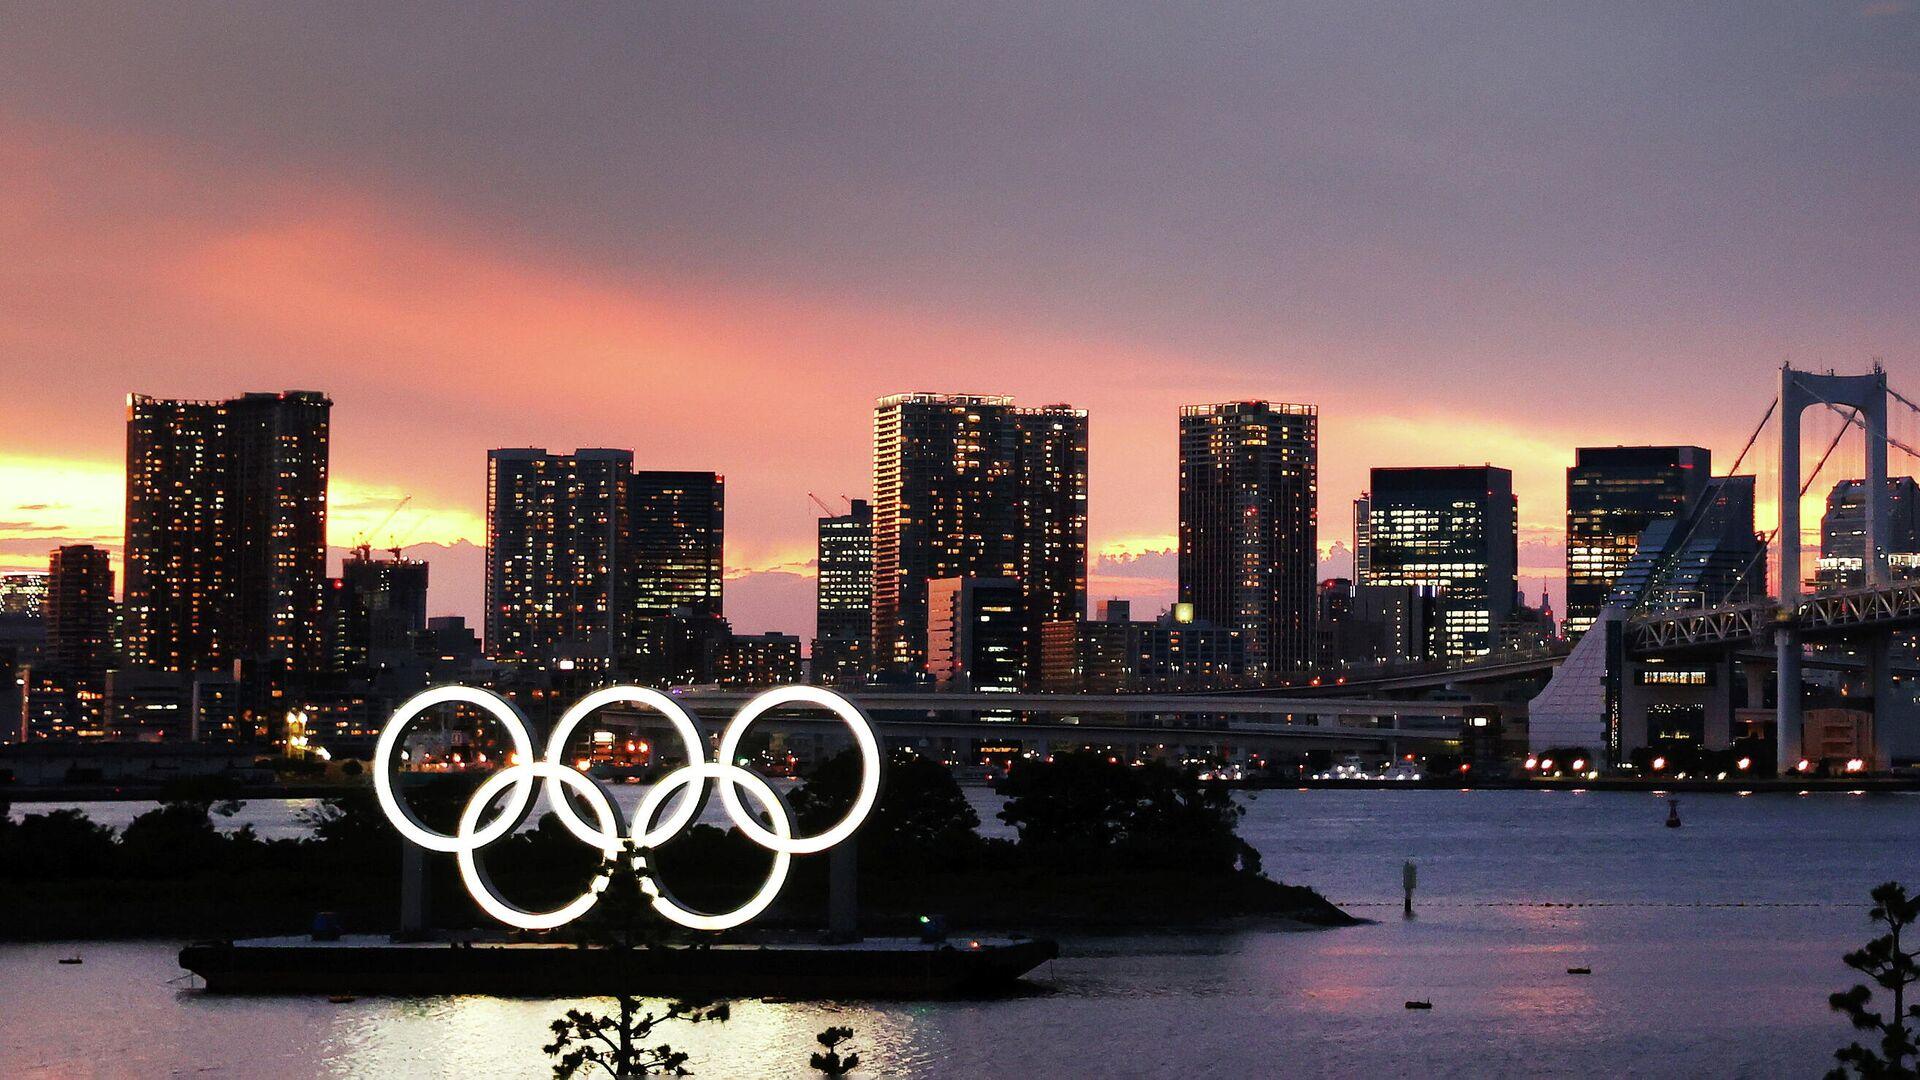 Олимпийские кольца в Токио - РИА Новости, 1920, 02.08.2021